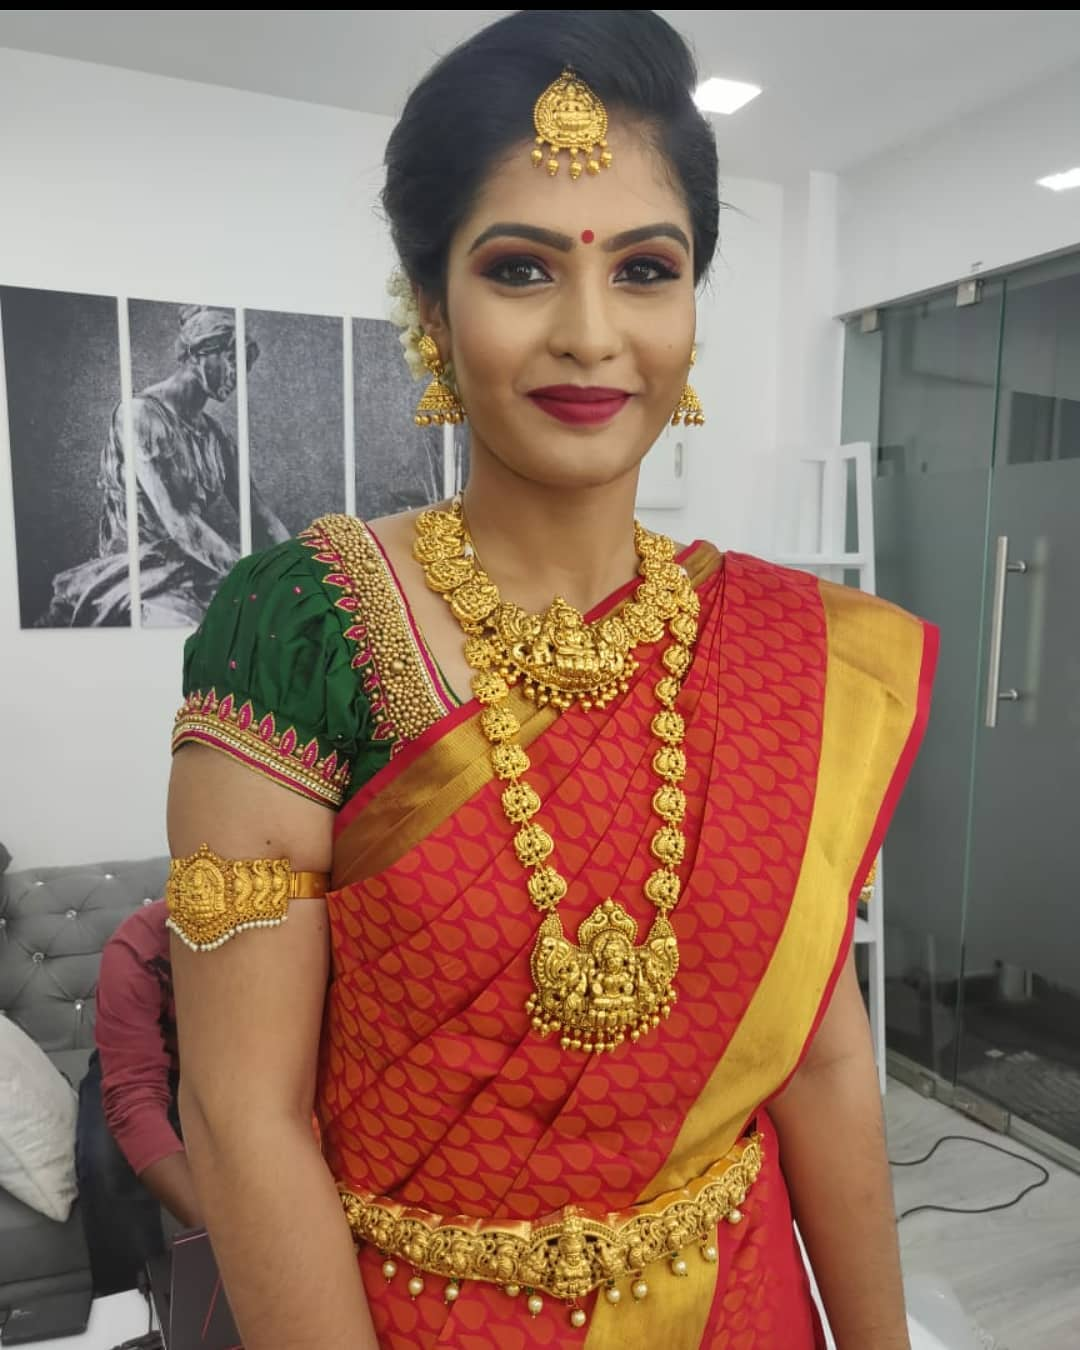 Bridal Jewellery for Rent in T Nagar, Anna Nagar   Antique Jewellery